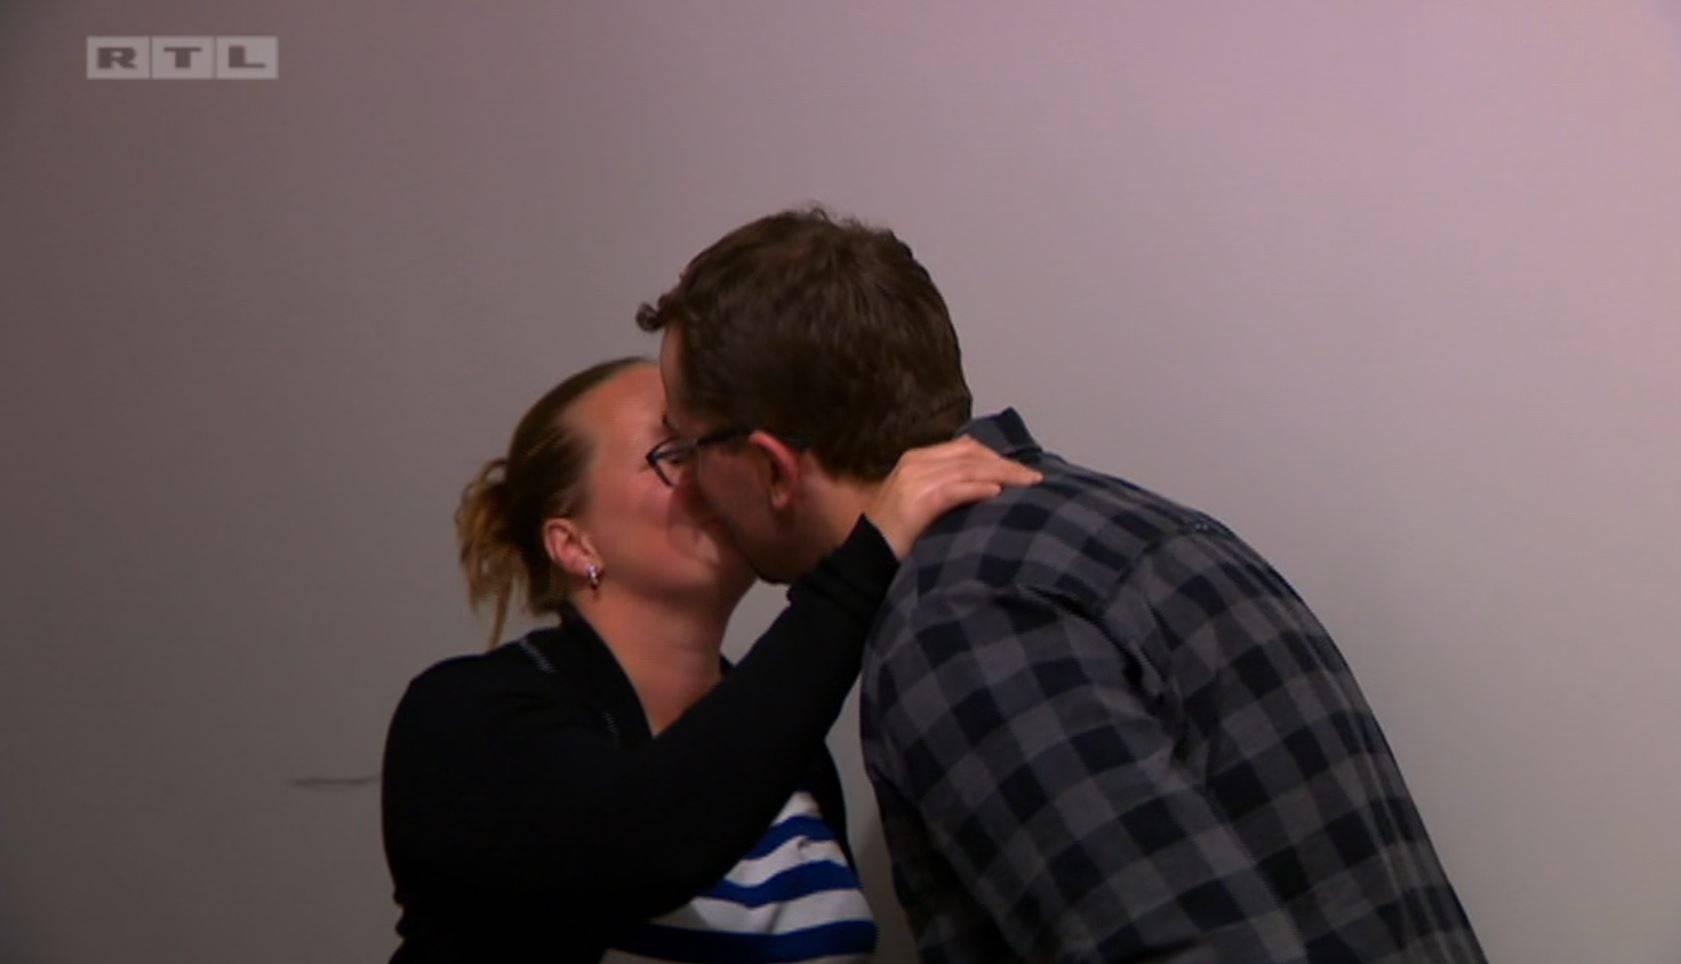 Pokušala je poljubiti Srećkovog prijatelja pa je svlačila farmera